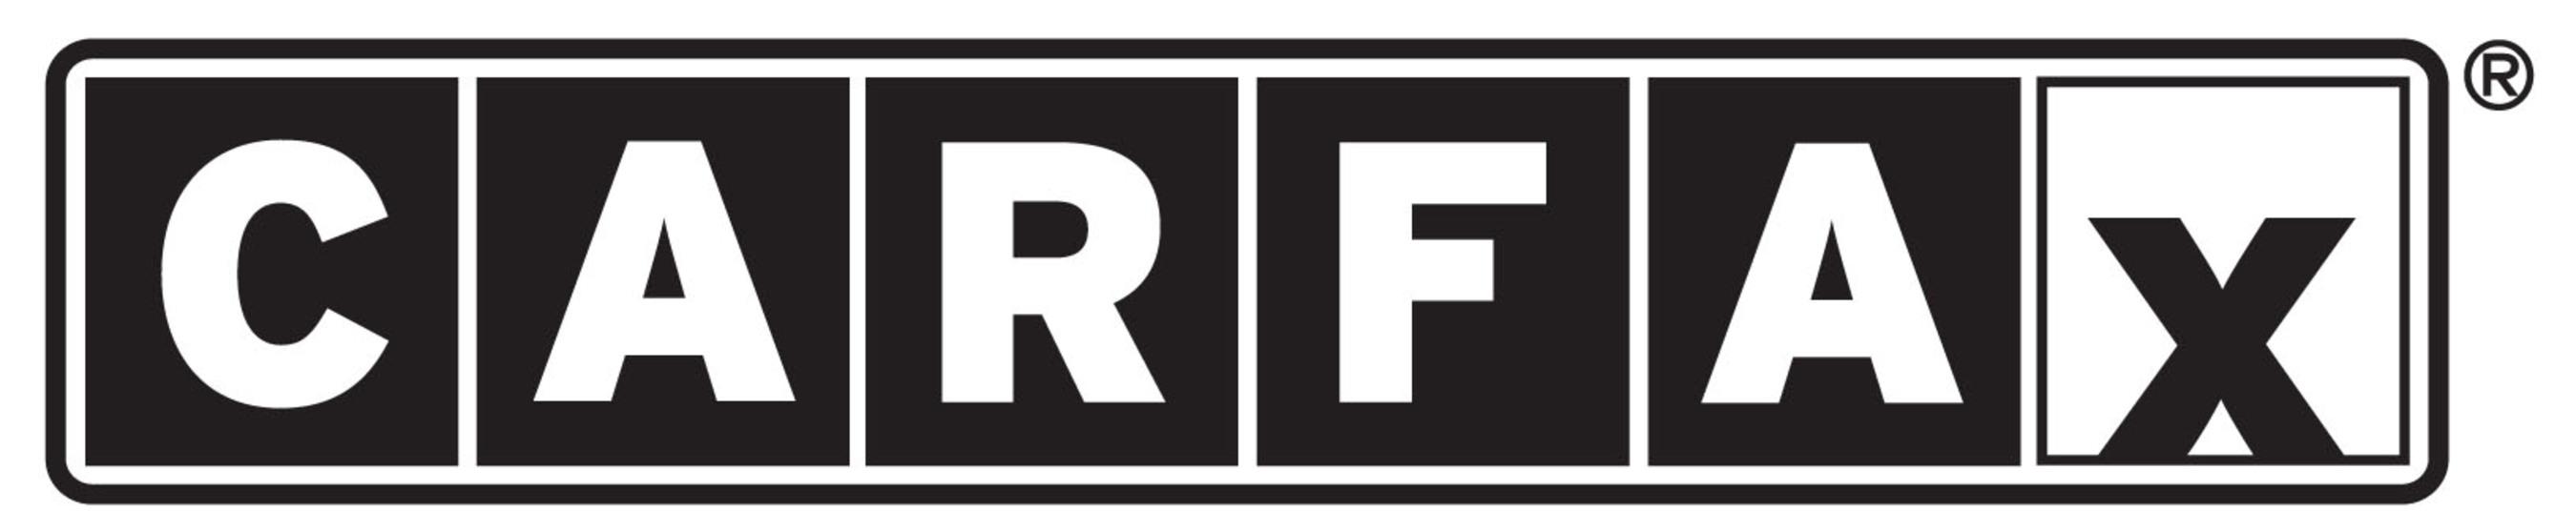 Carfax logo. (PRNewsFoto/Carfax)